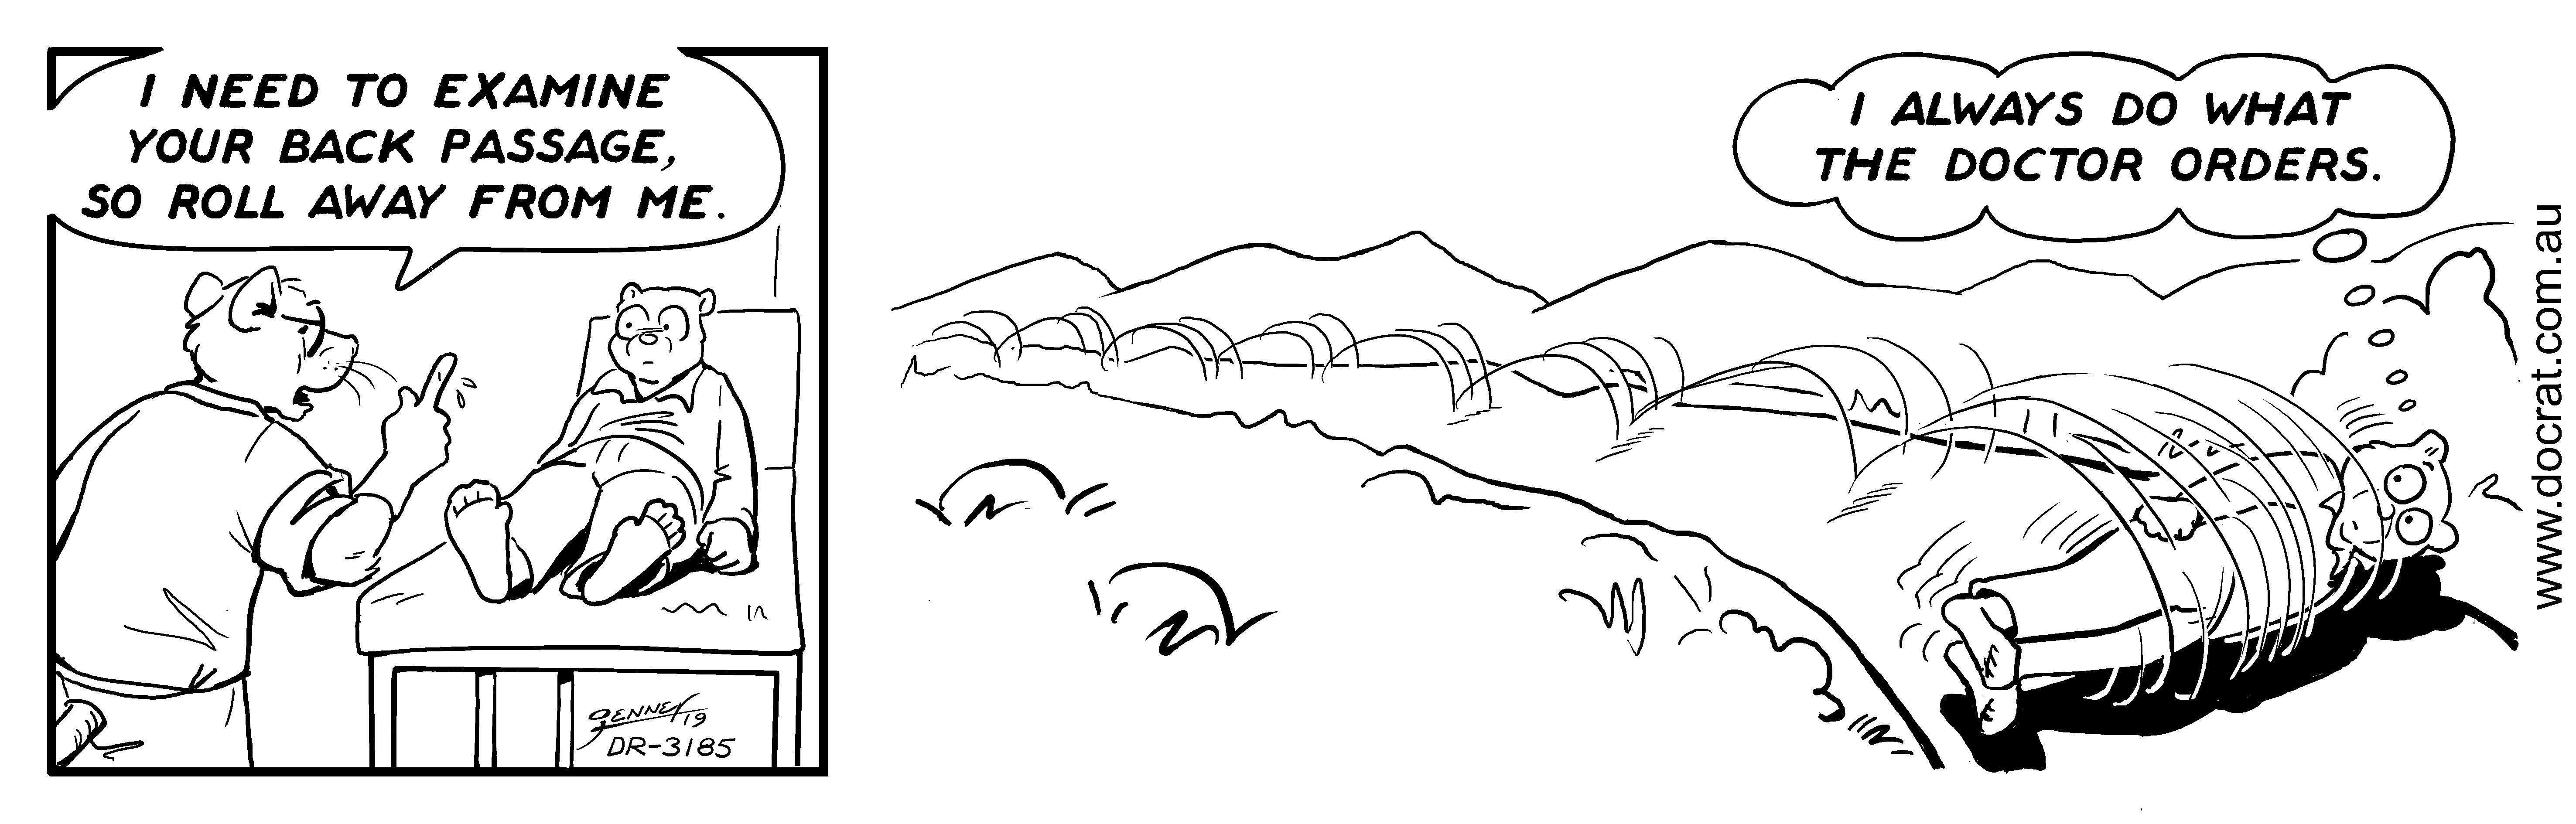 20190222